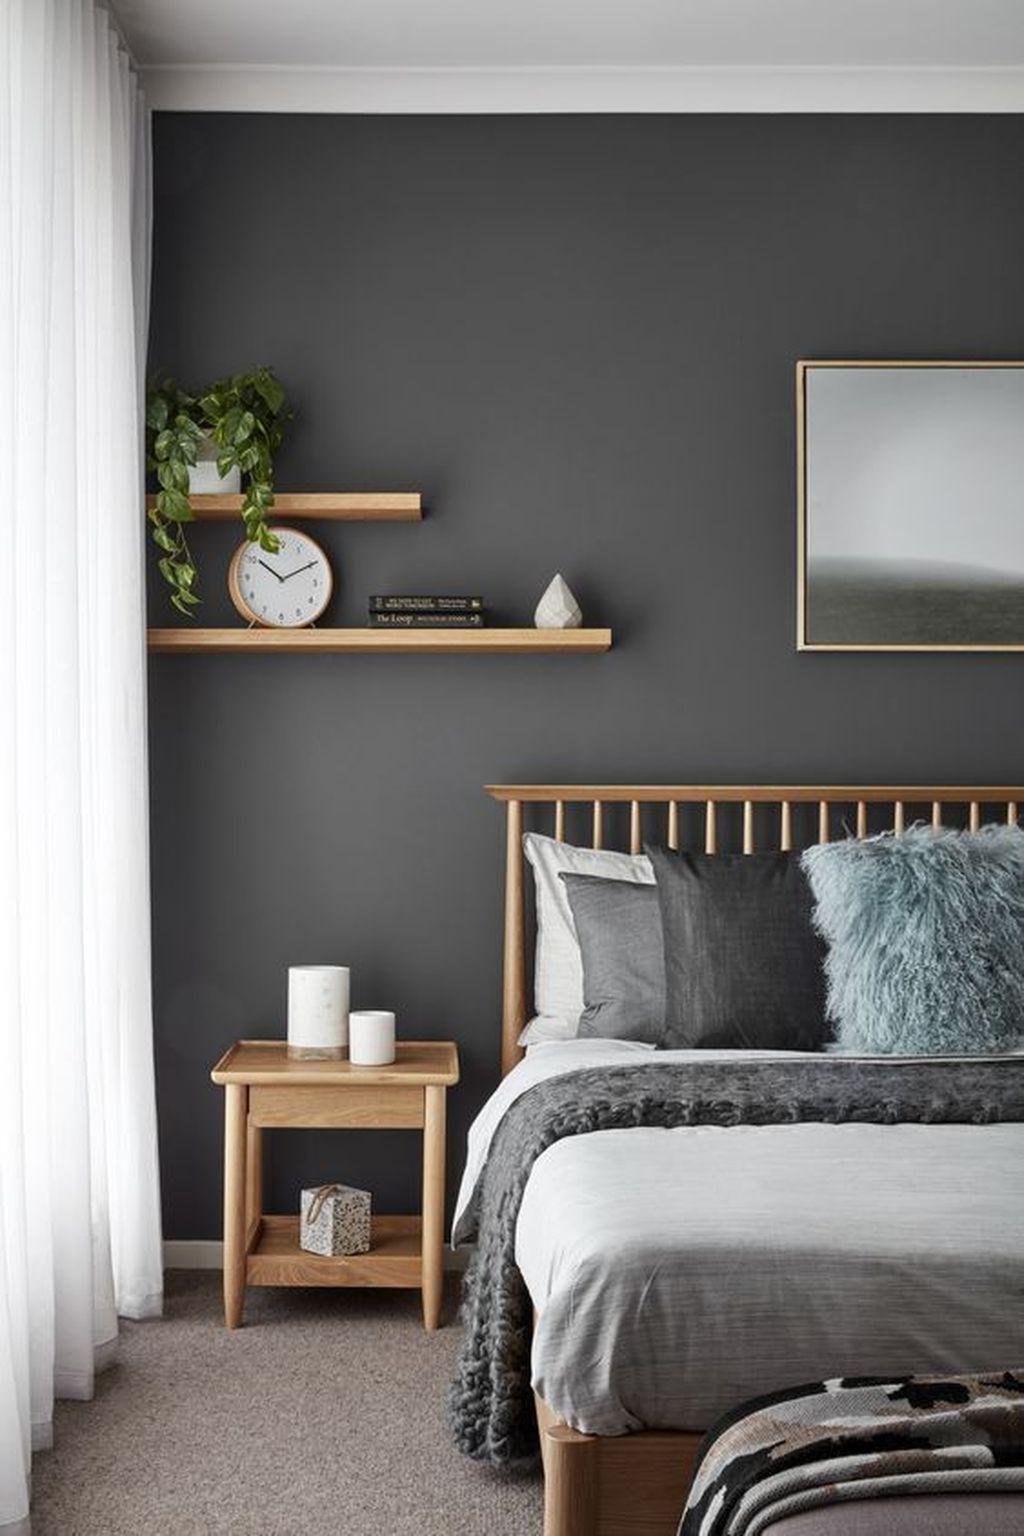 Fabulous Diy Bedroom Decor Ideas To Inspire You 32